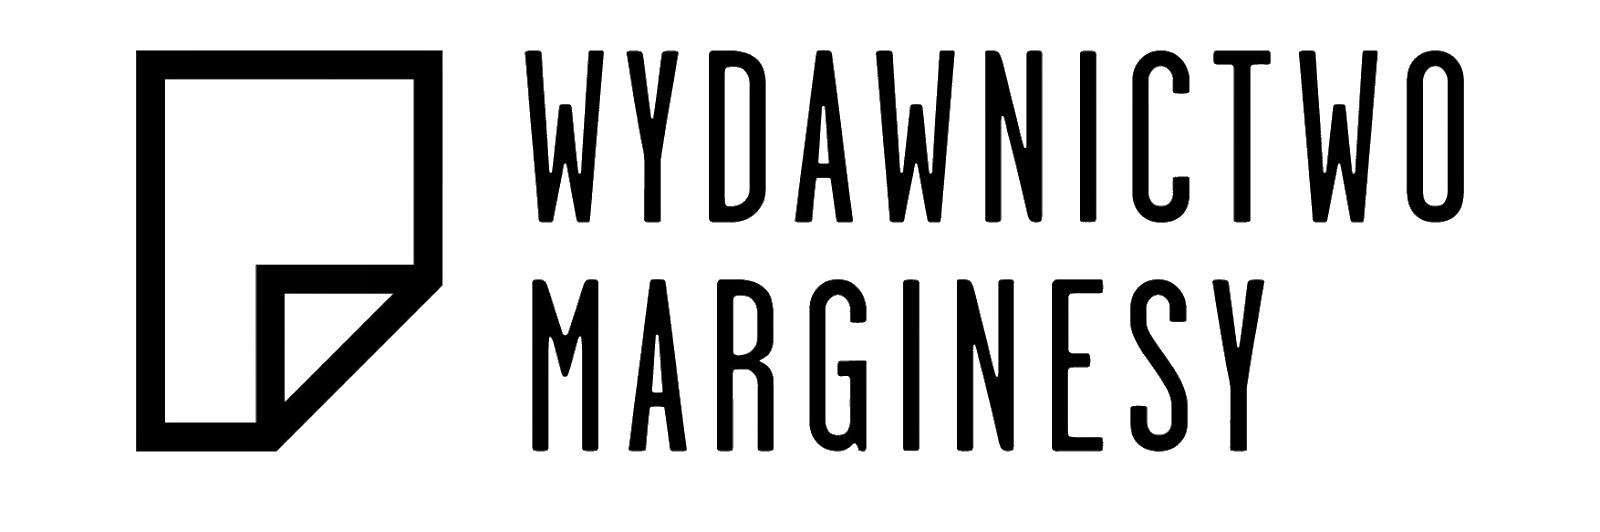 http://marginesy.com.pl/